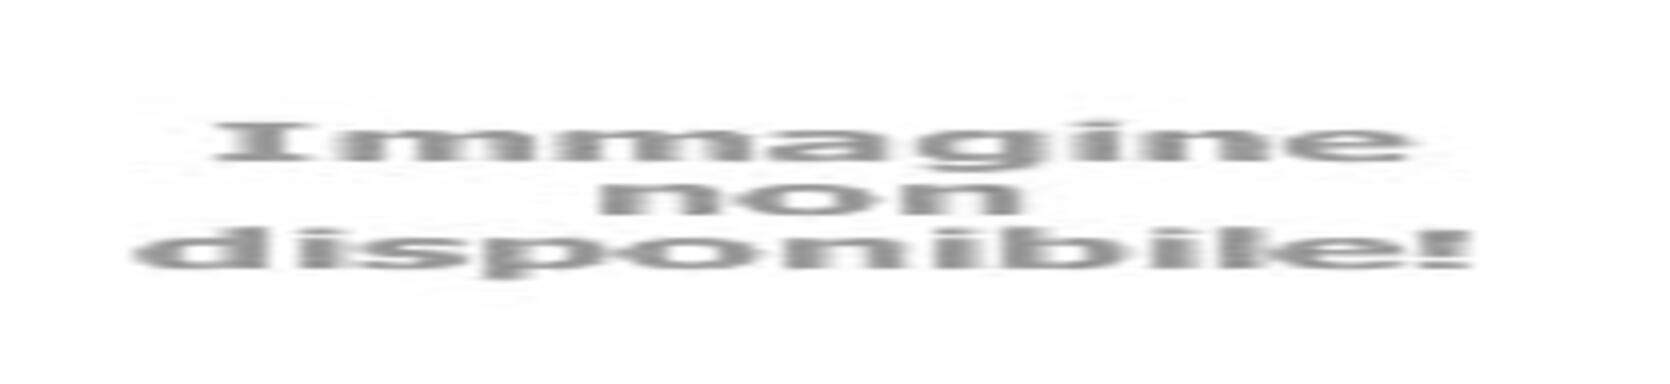 basketriminicrabs it 6-1077-video-ceccarules-n.17 003